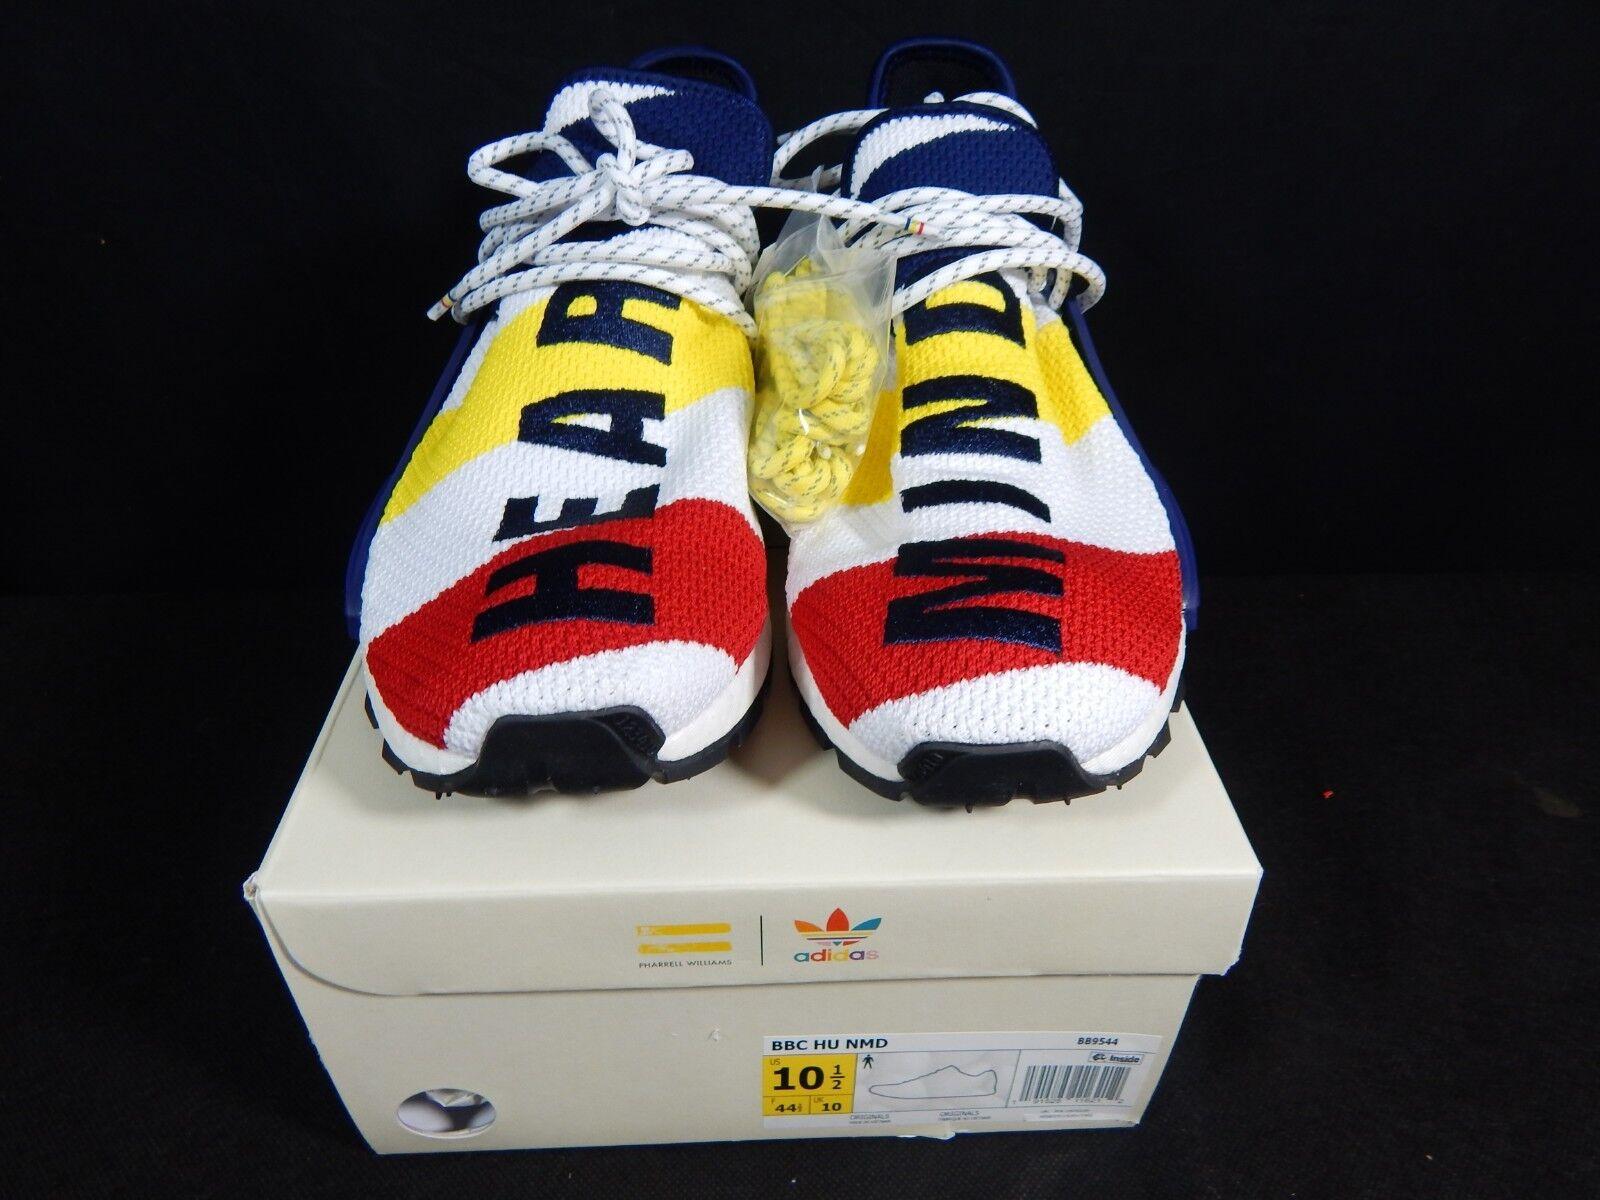 Adidas NMD Hu Pharrell x BBC Size 10.5 Billionaire Boys Club Multi-color IN HAND